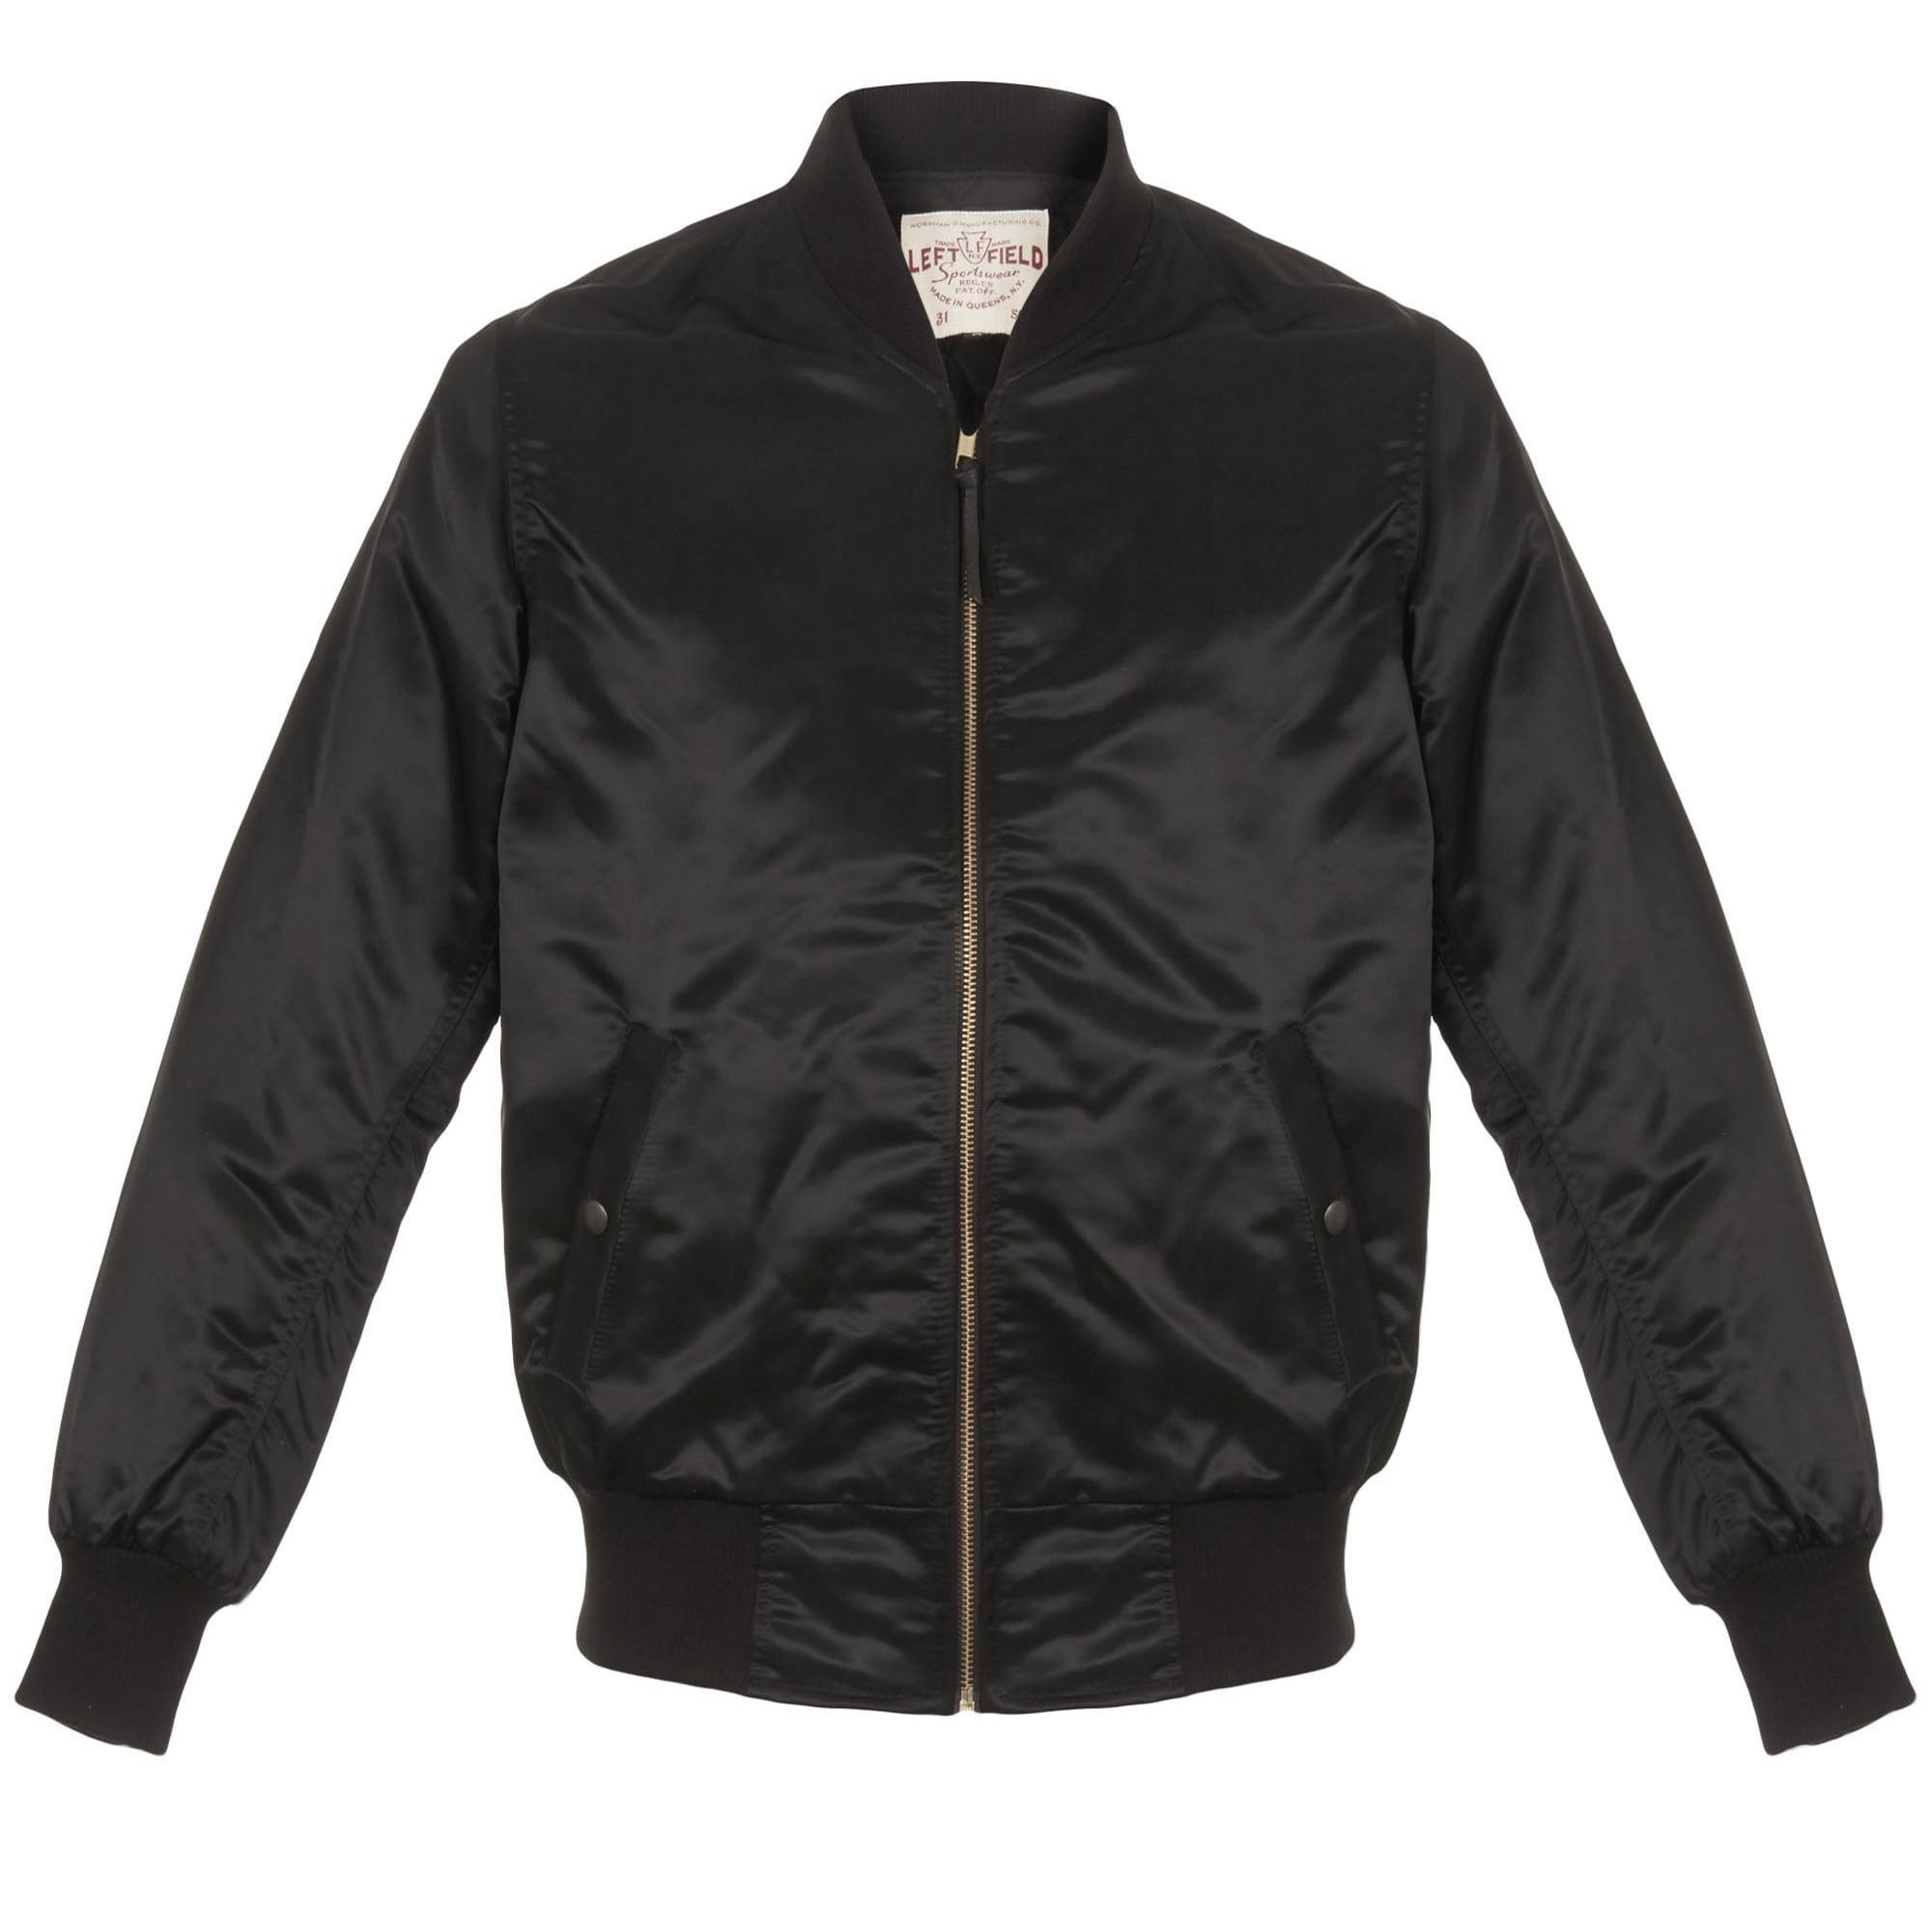 Left Hand Clothing Store Car Club Black Jacket